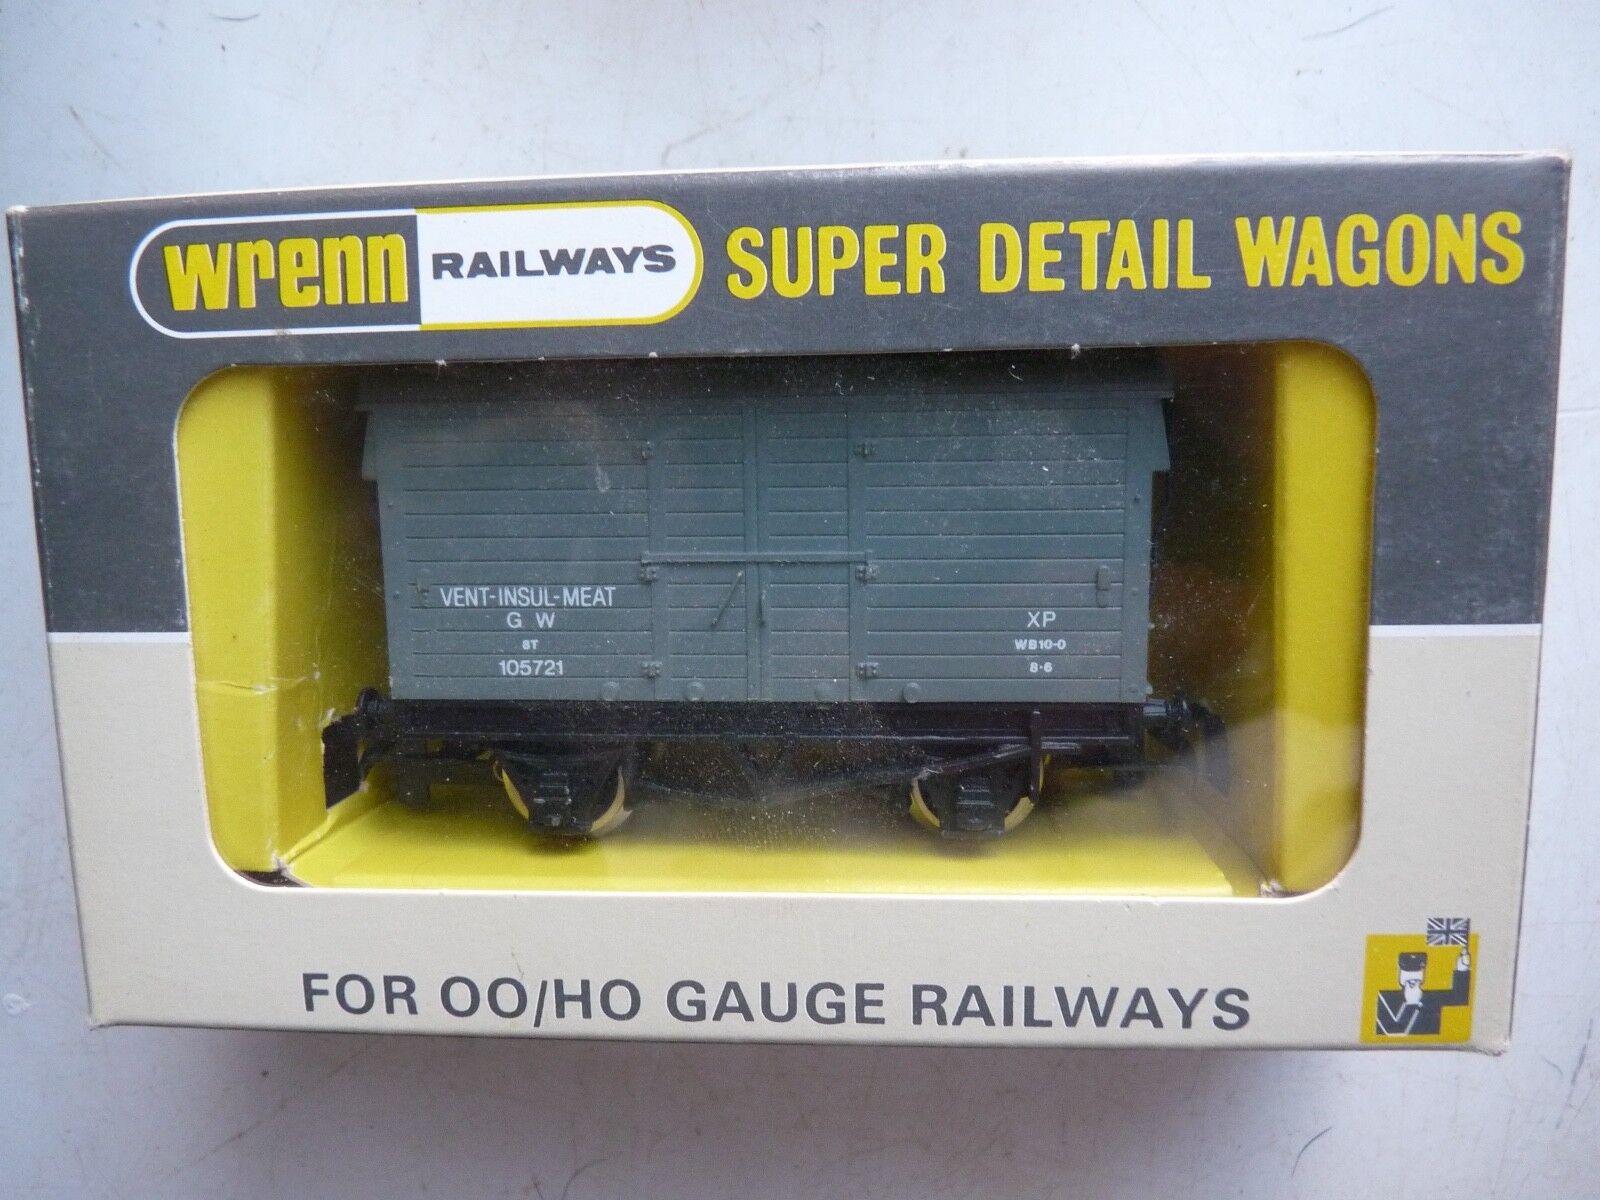 RARE WRENN W.5094 G.W.grigio VENTILATED VAN  scatolaED